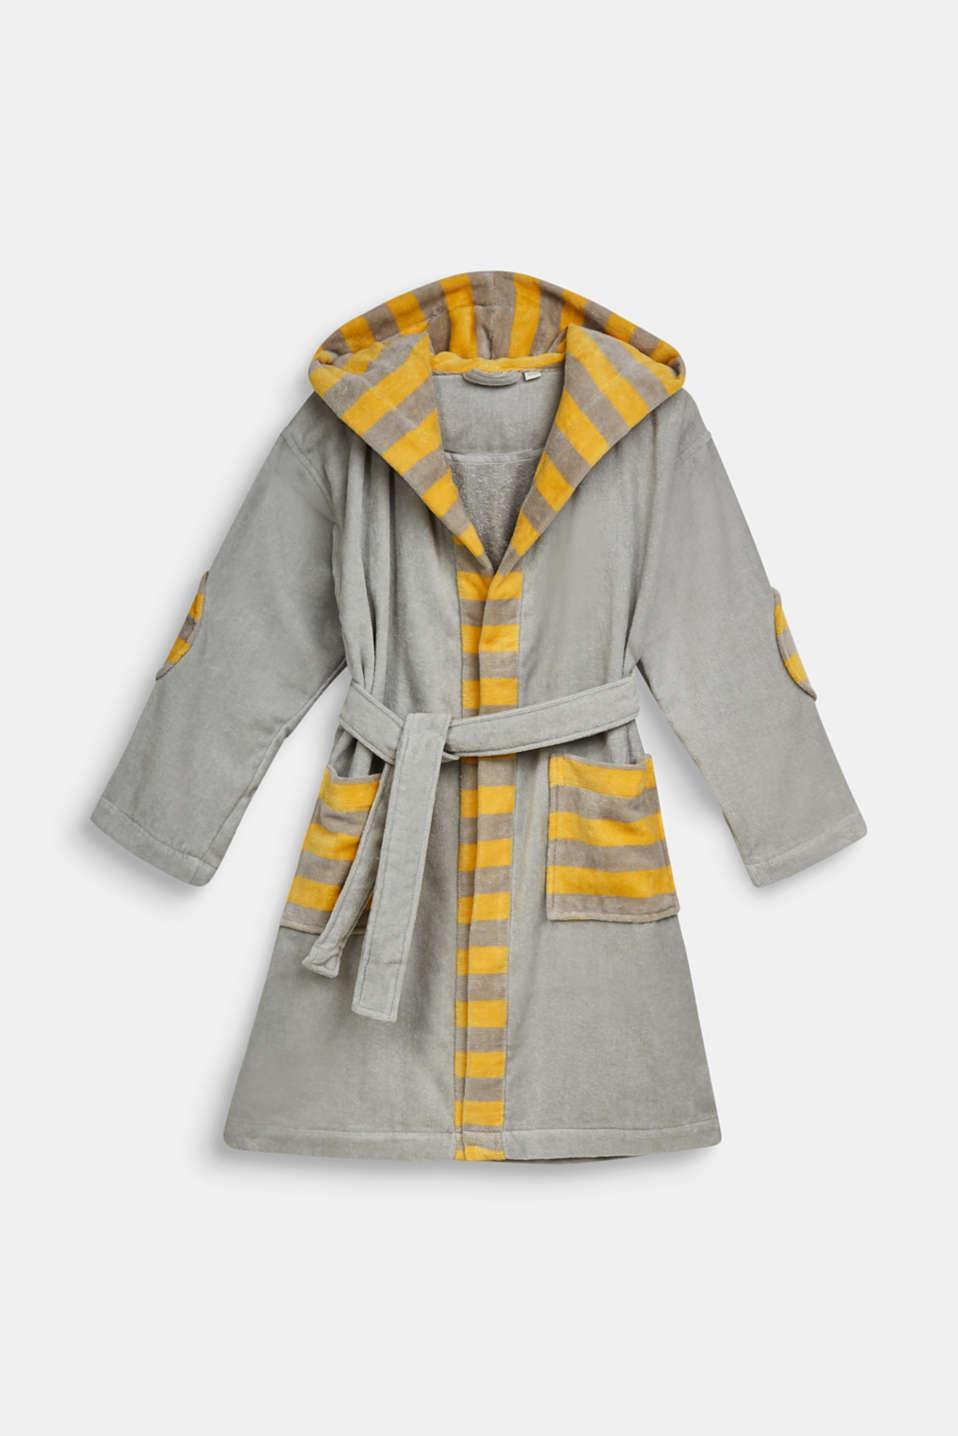 Children's bathrobe in 100% cotton, STONE, detail image number 0